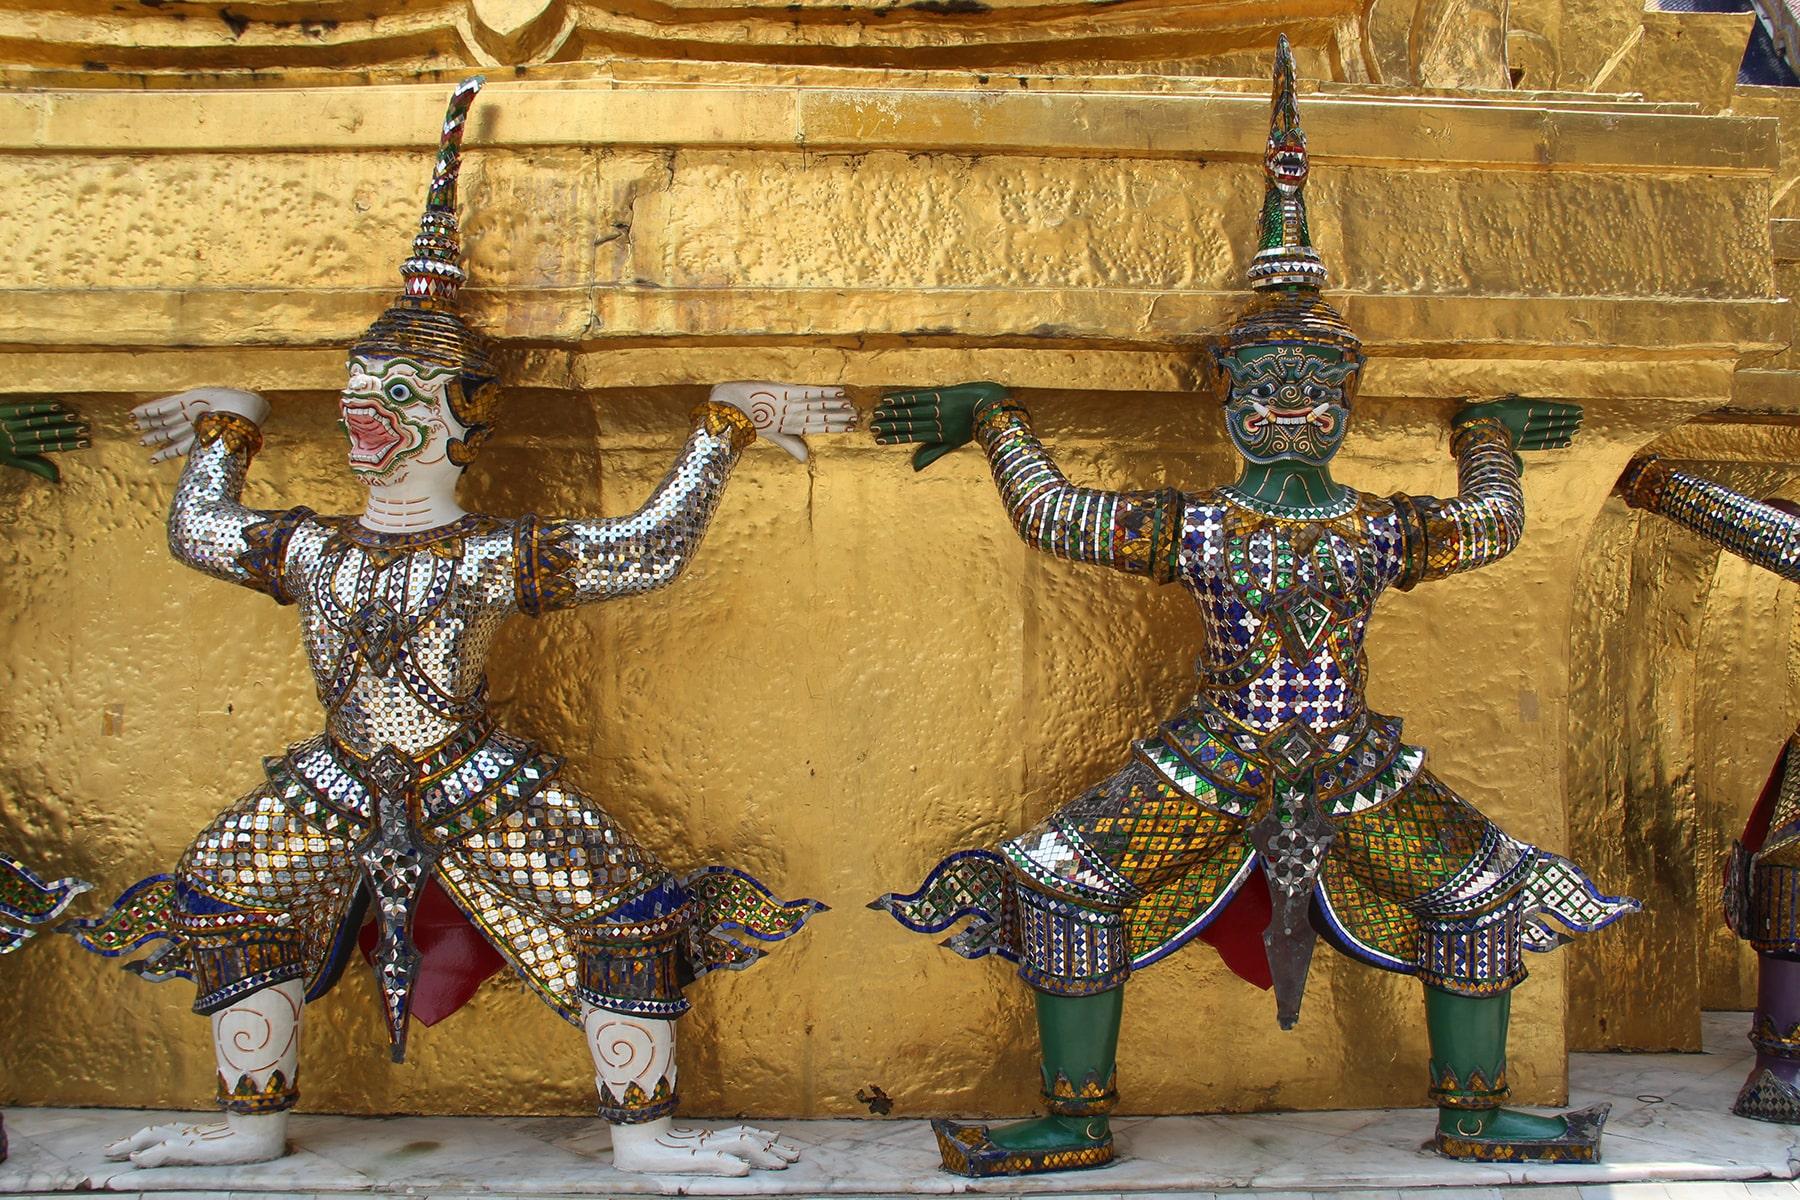 Yaks, demoni che sorreggono uno stupa